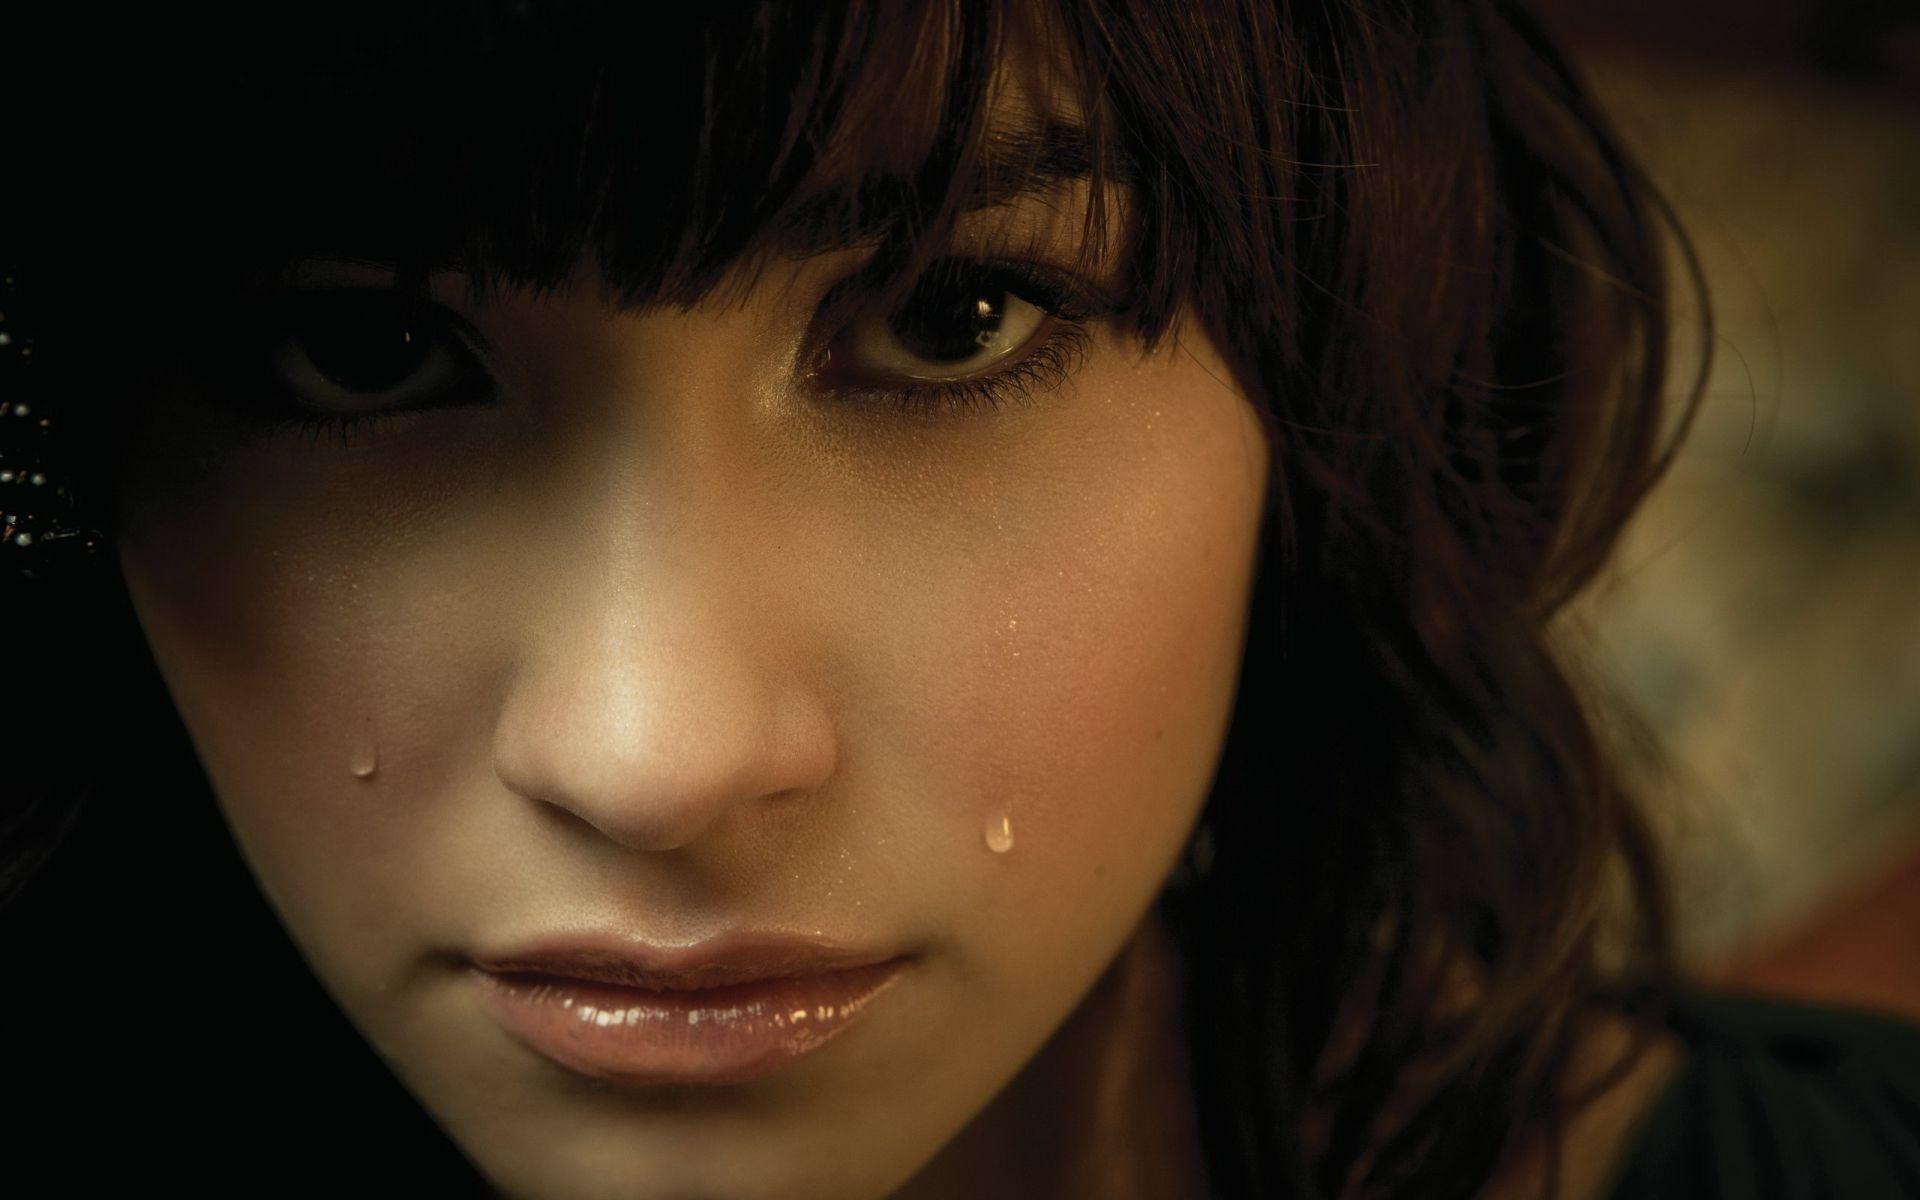 Фото на аву плачущую